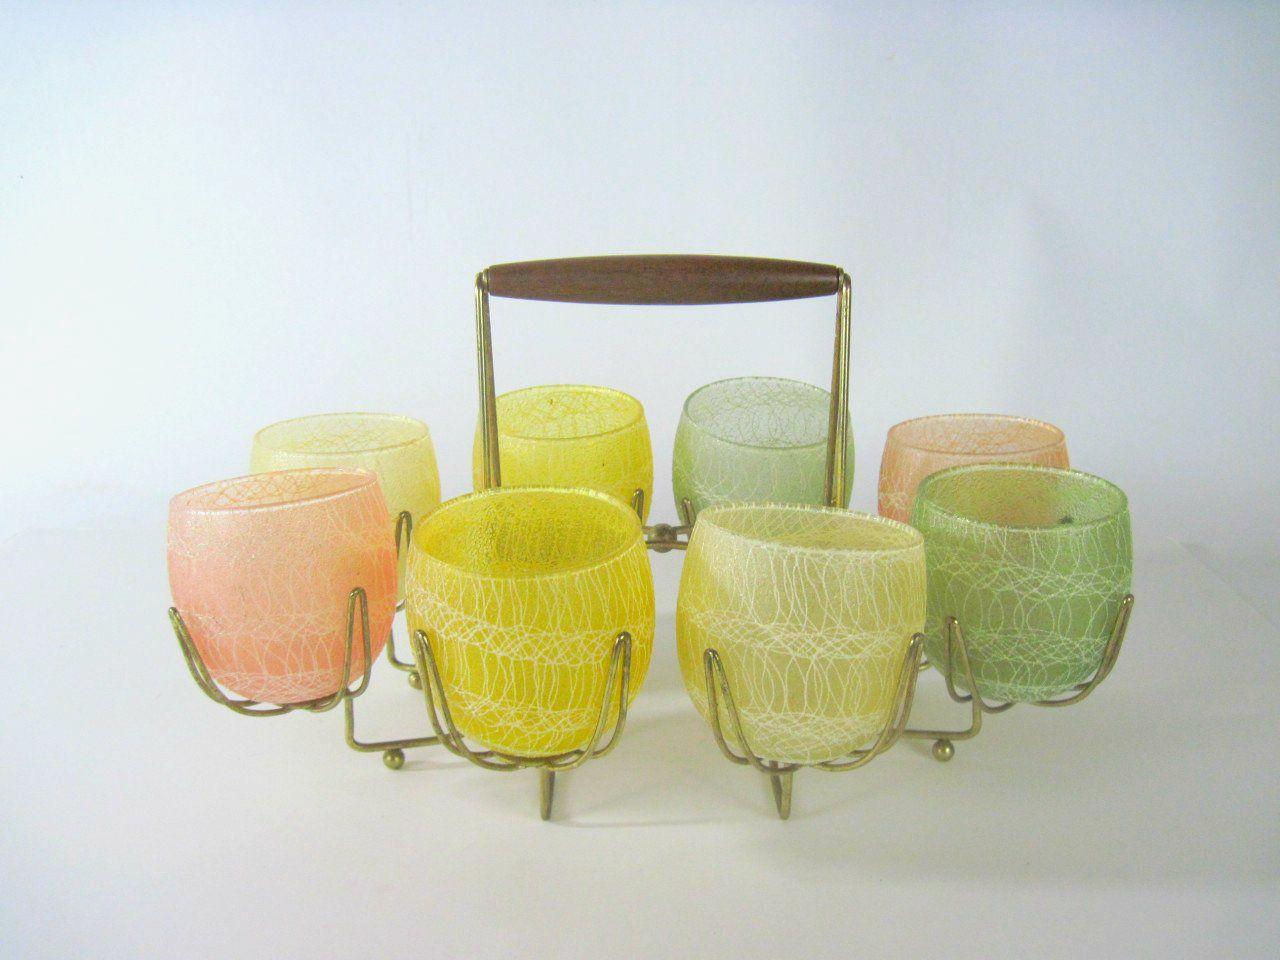 Fun Mid Century Modern glassware. Spaghetti glass set with